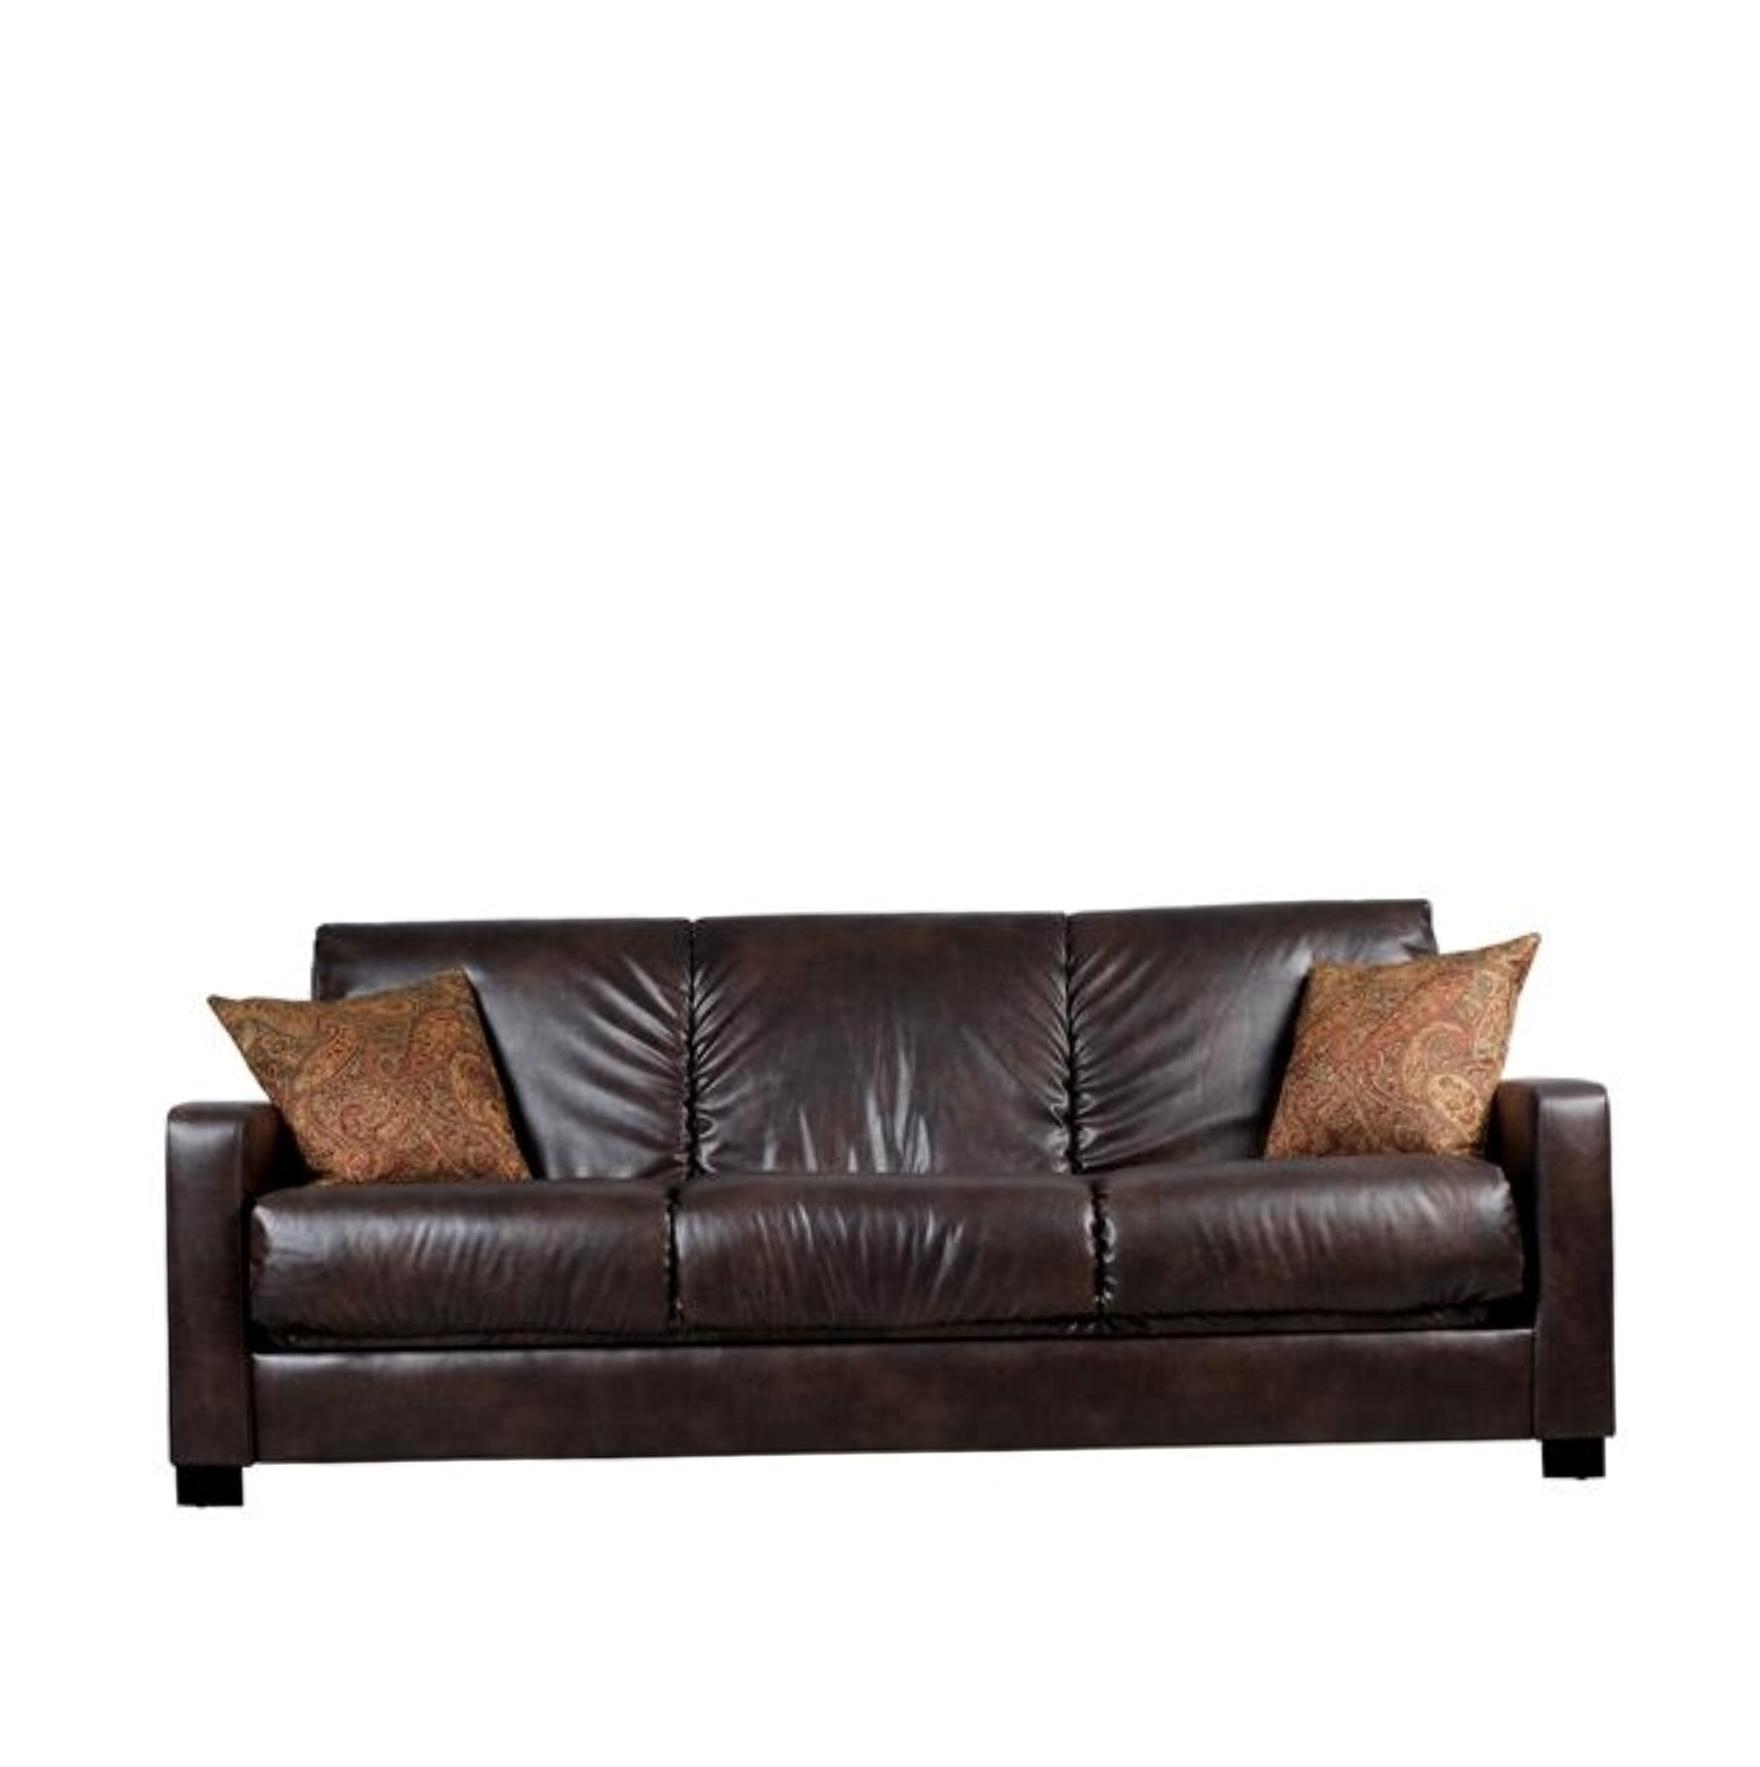 Brown Leather Sofa Cushions Home Design Ideas